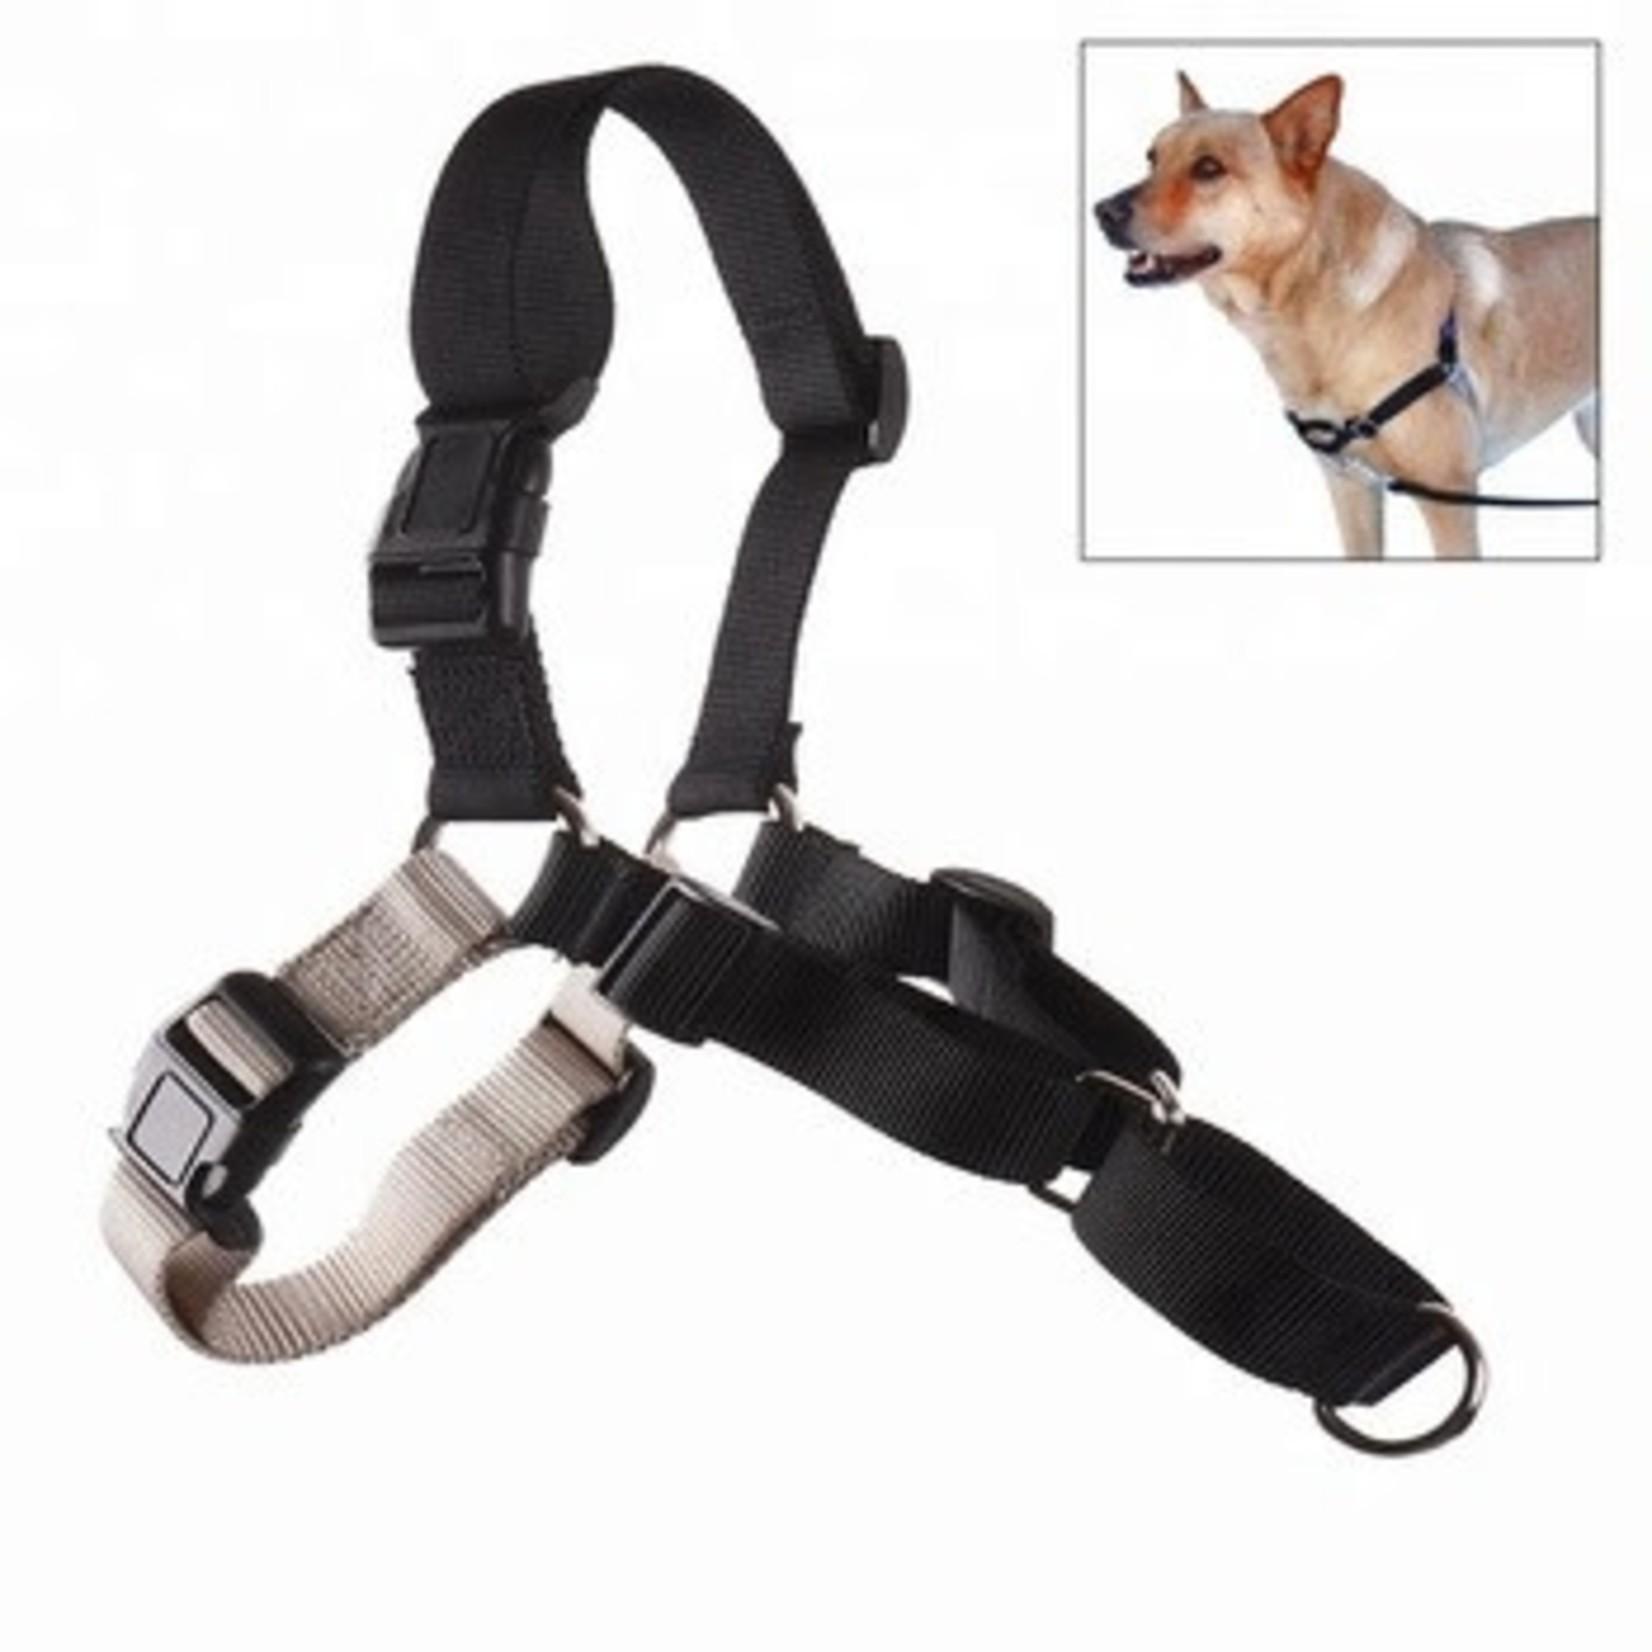 Pet Safe / Radio Systems Corp. Easy Walk Harness Black Small/Medium